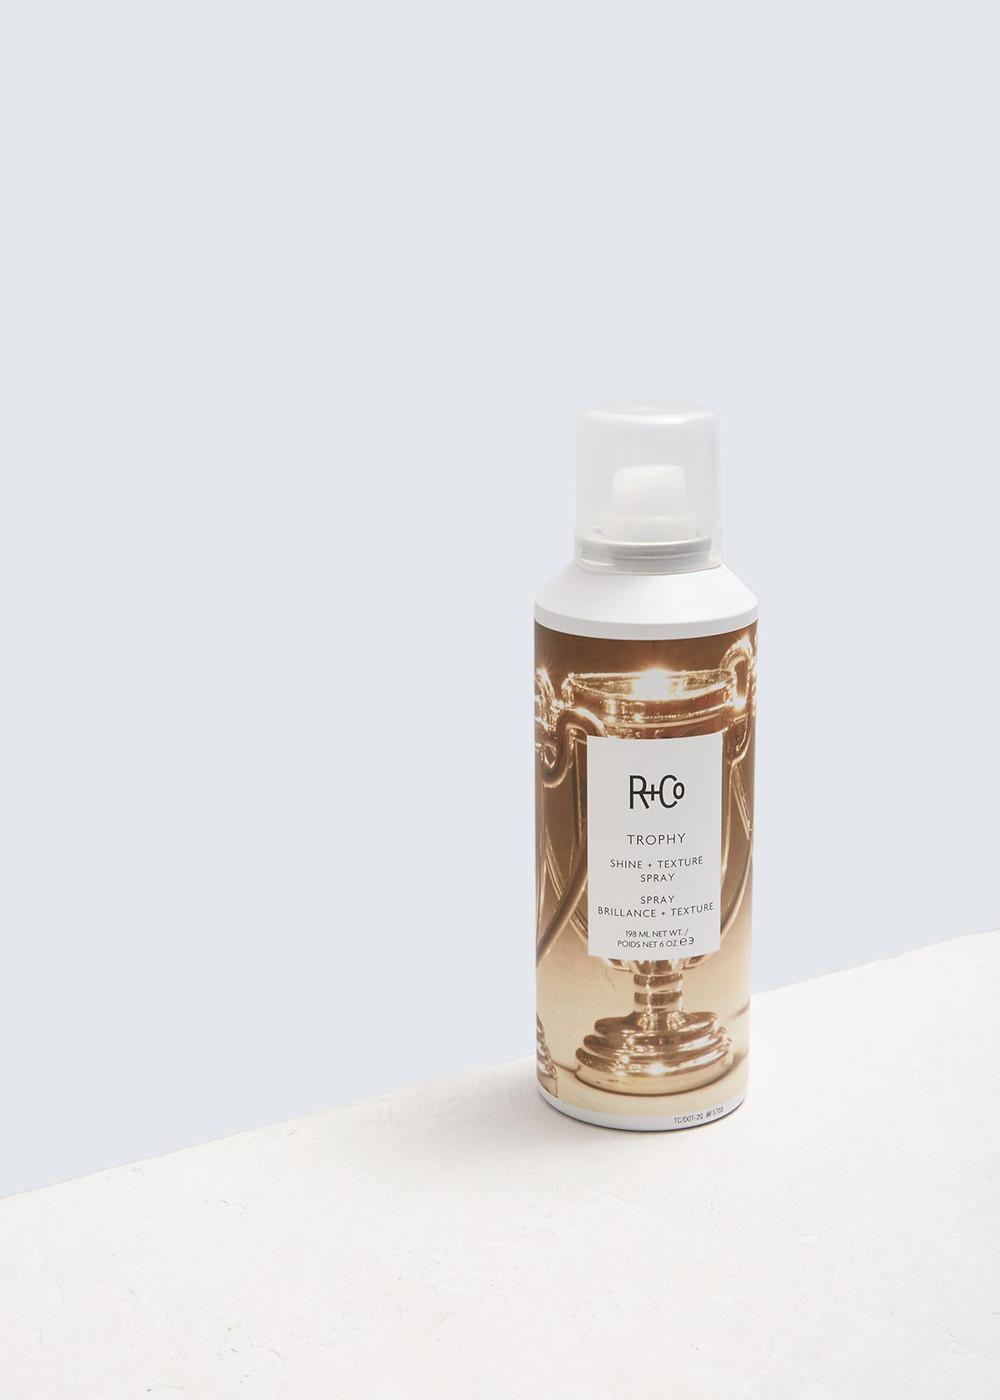 R + Co Trophy Shine + Texture Spray